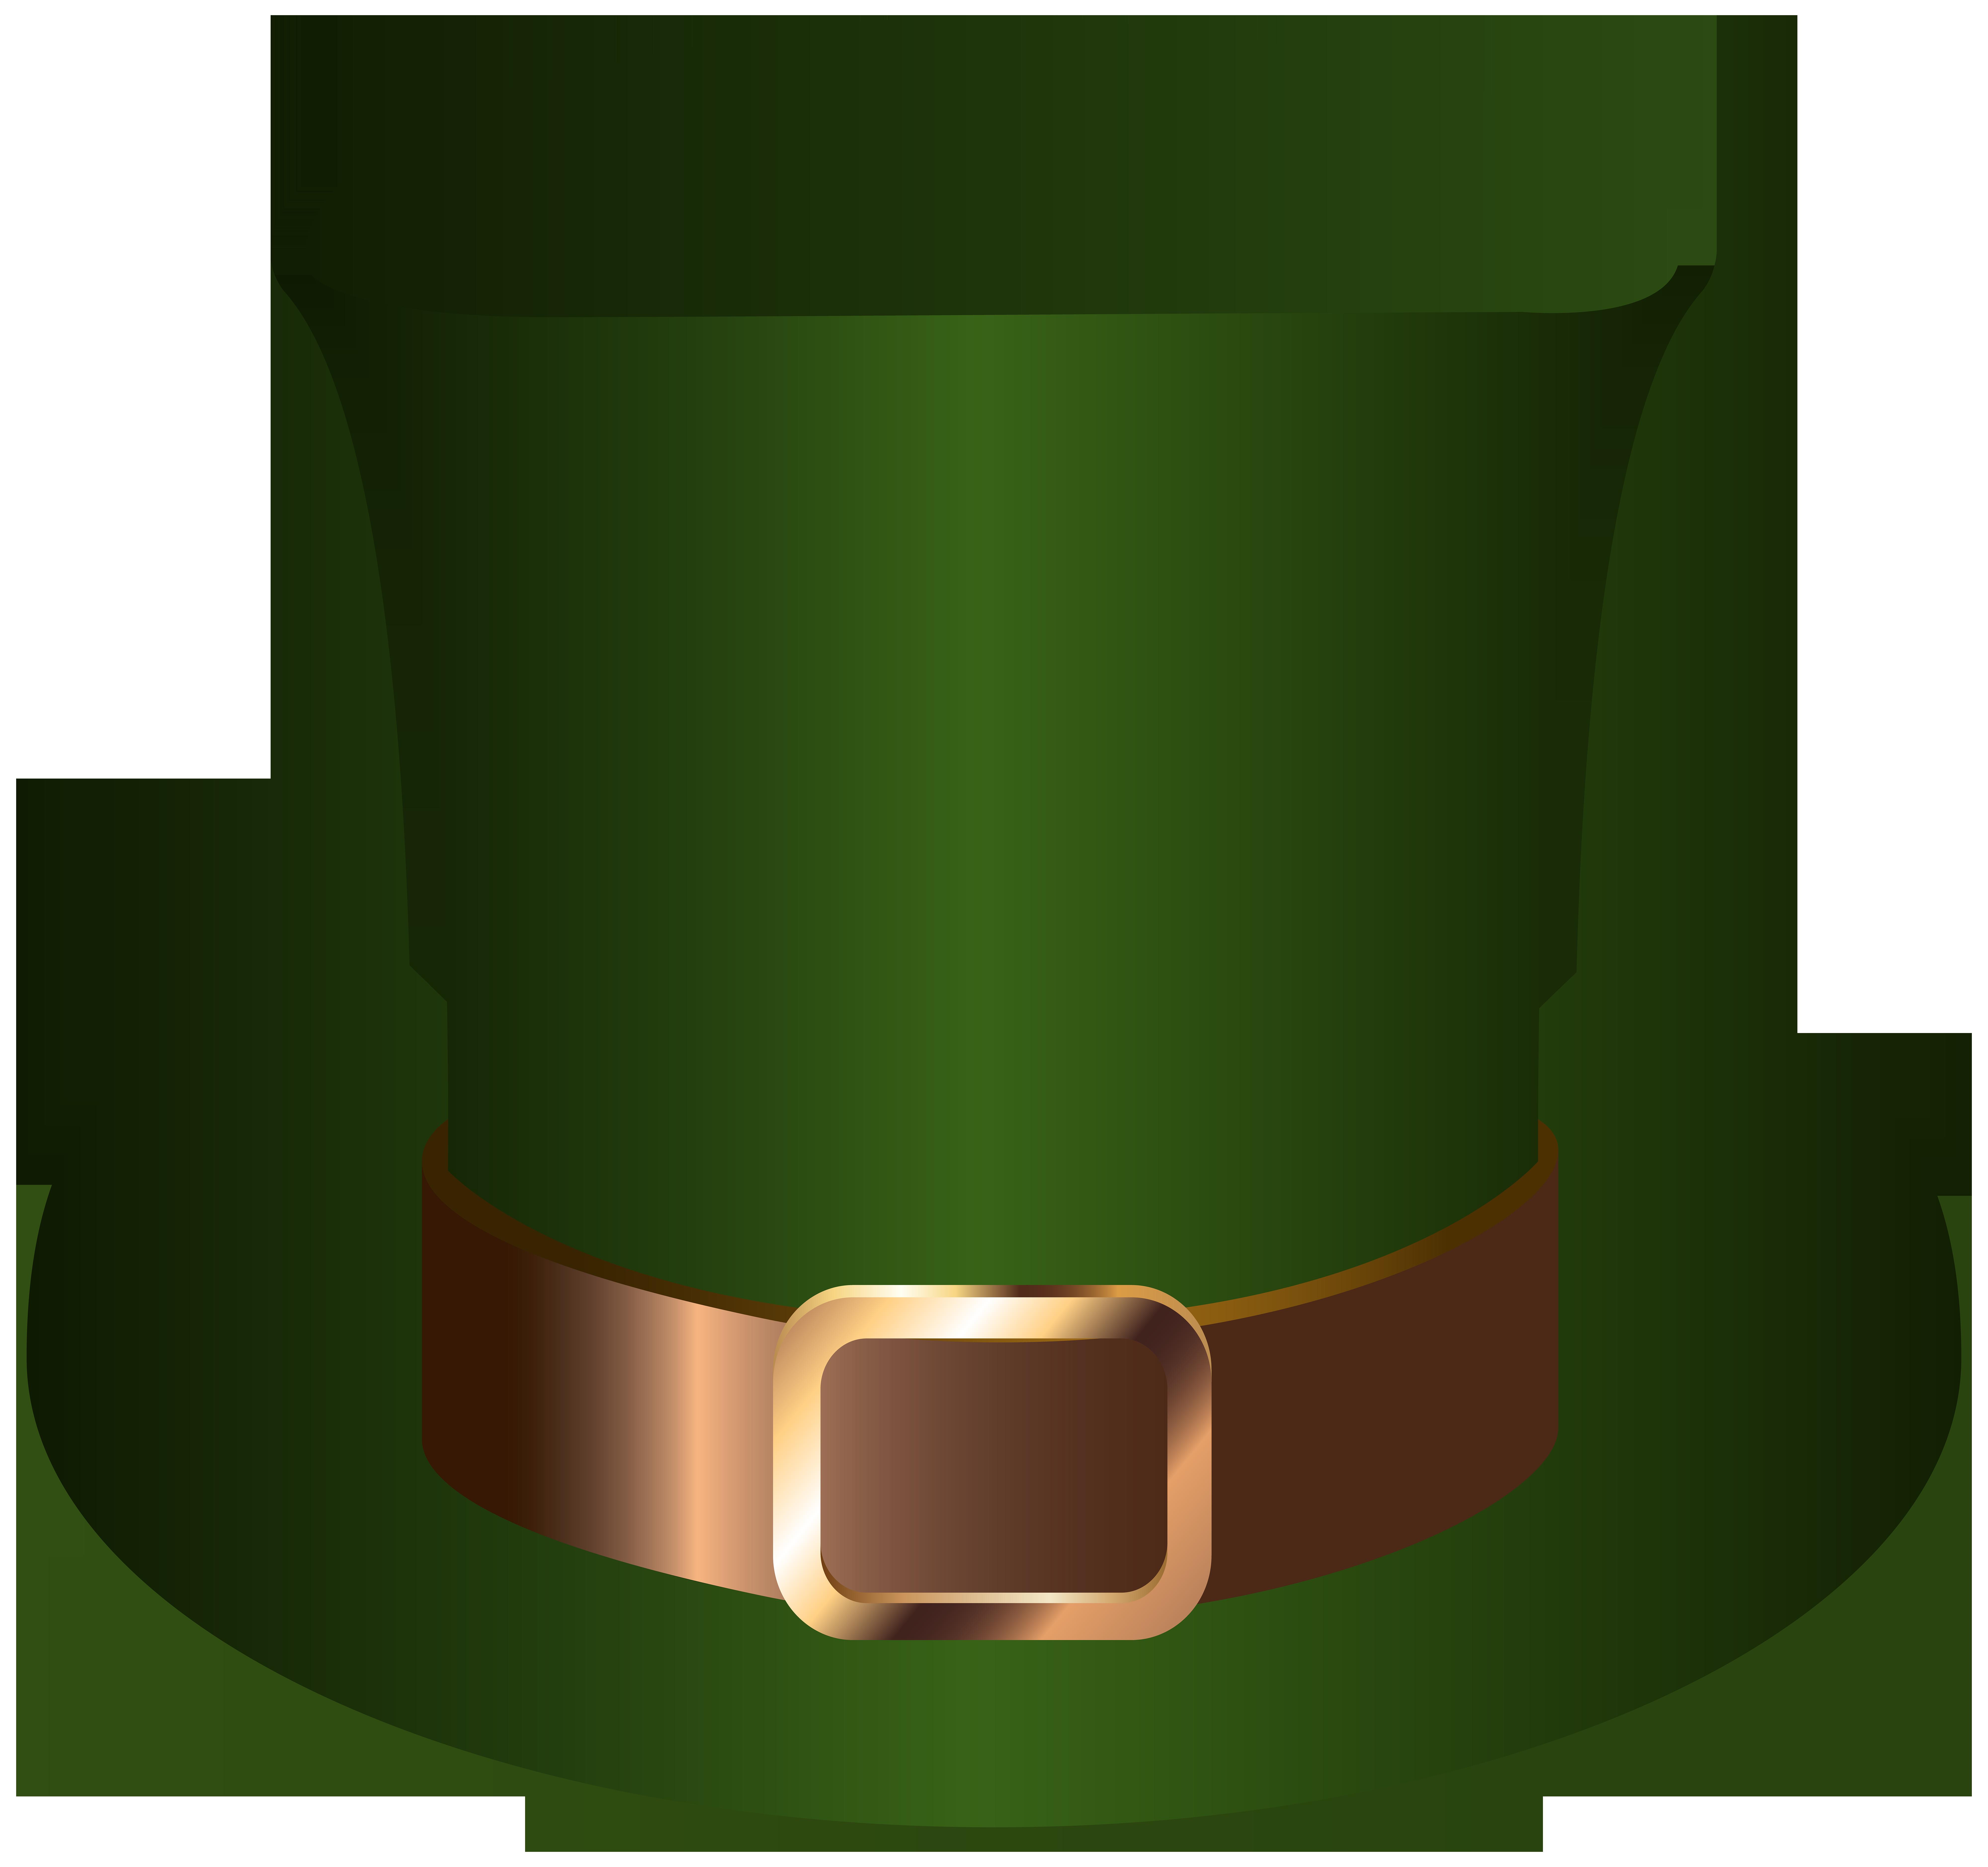 8000x7513 Saint Patrick's Leprechaun Hat Clip Art Imageu200b Gallery